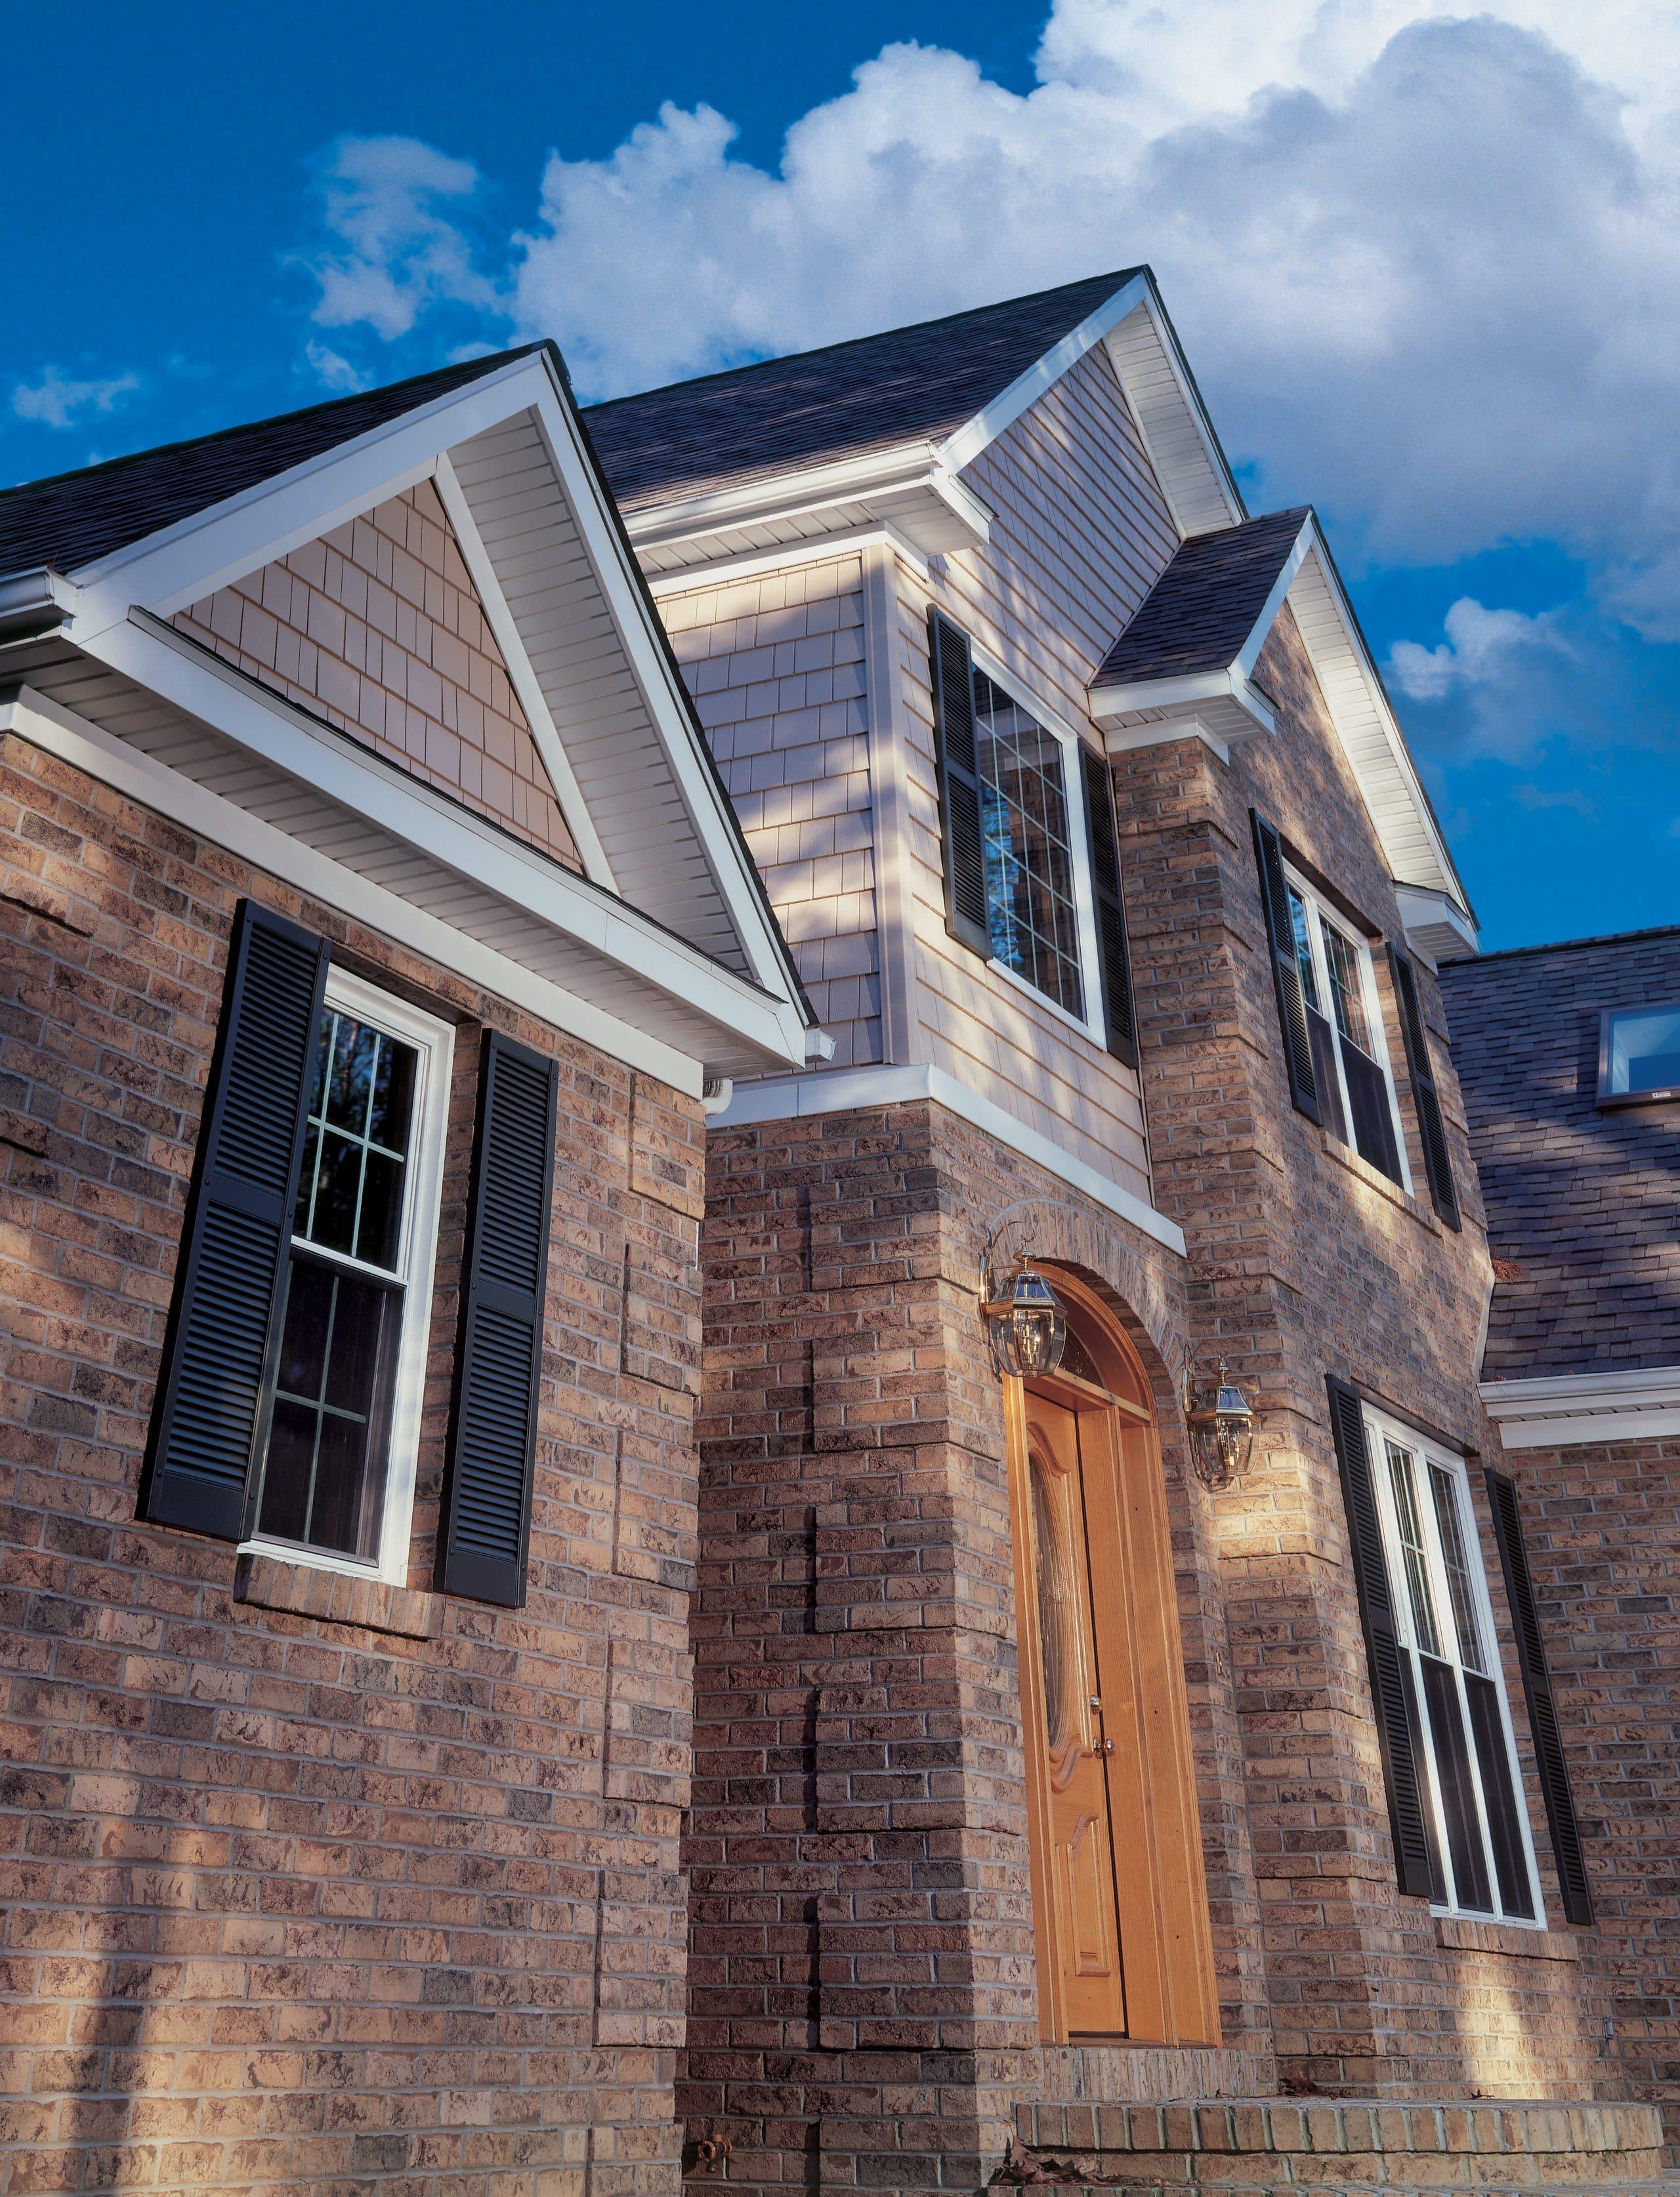 Mastic Home Exteriors And Siding Productsa B Edward